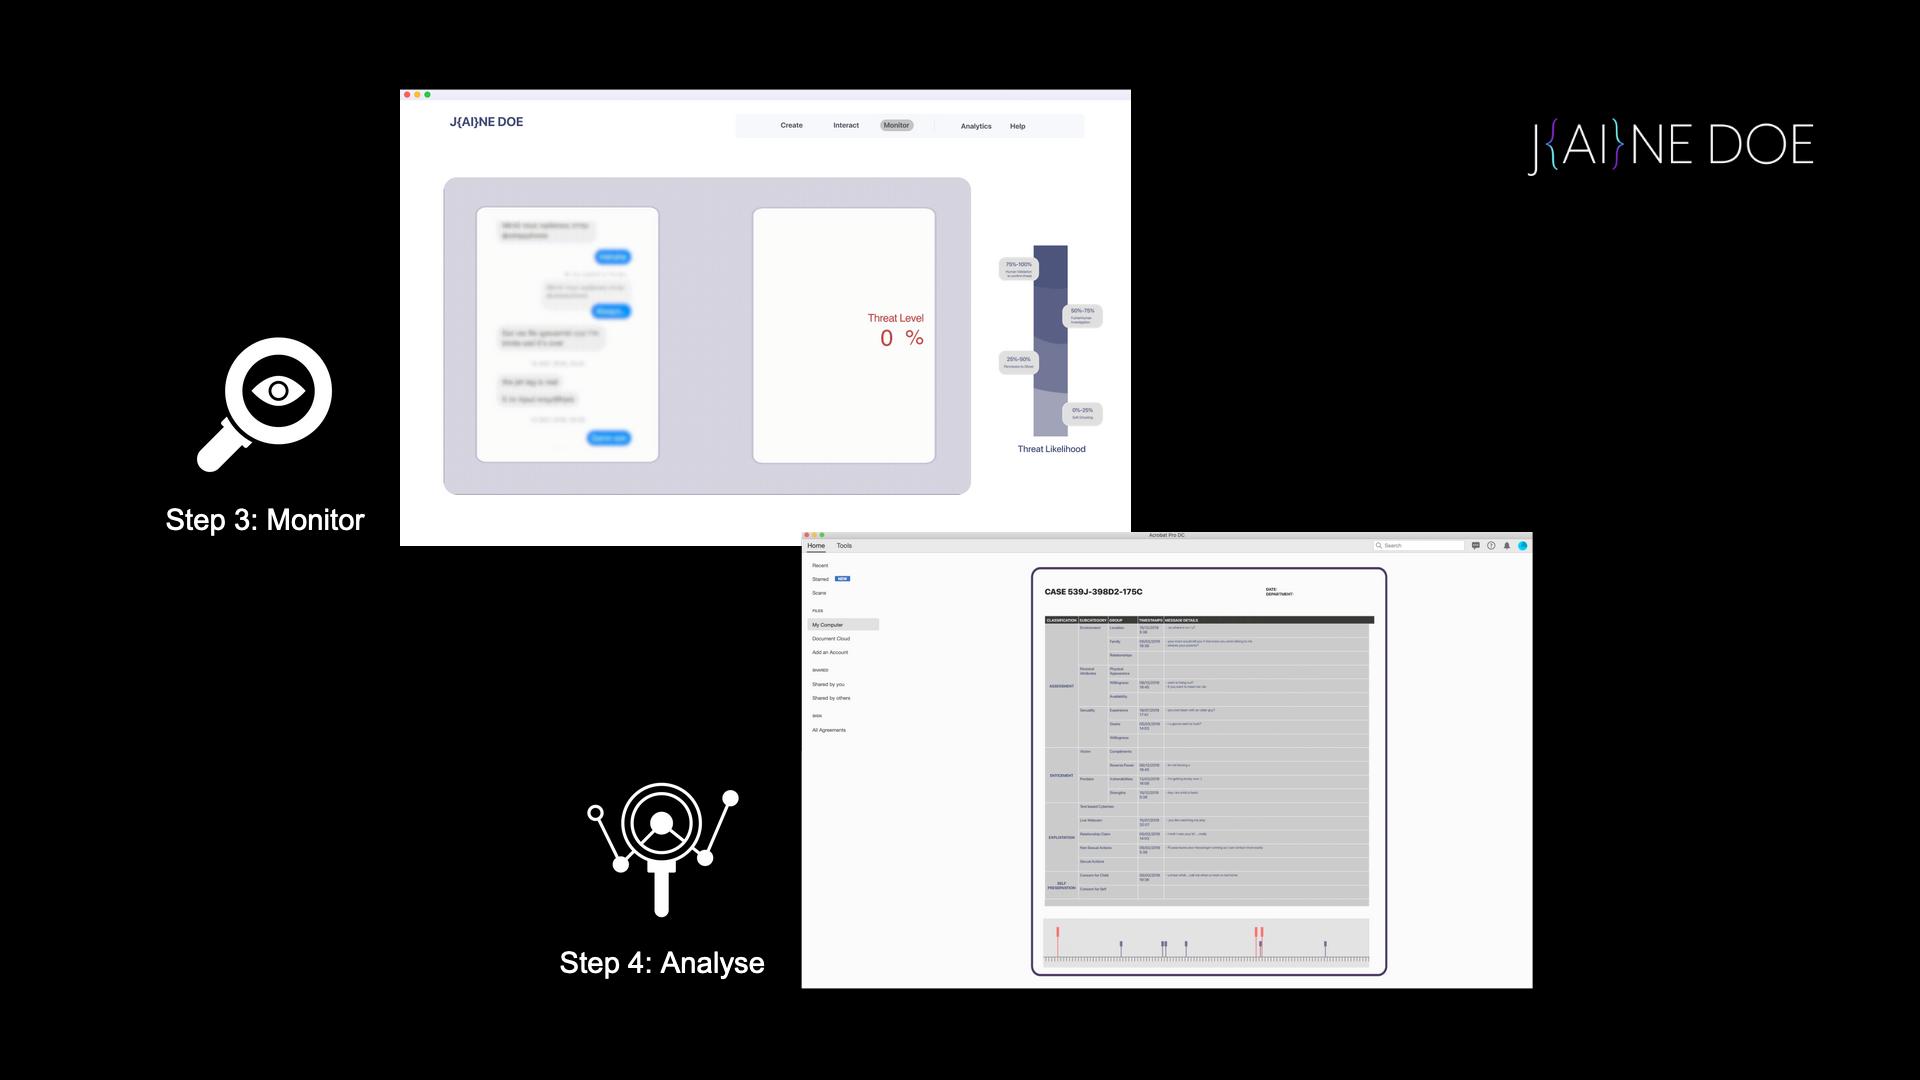 J{AI}}NE DOE: Monitor & Analyze